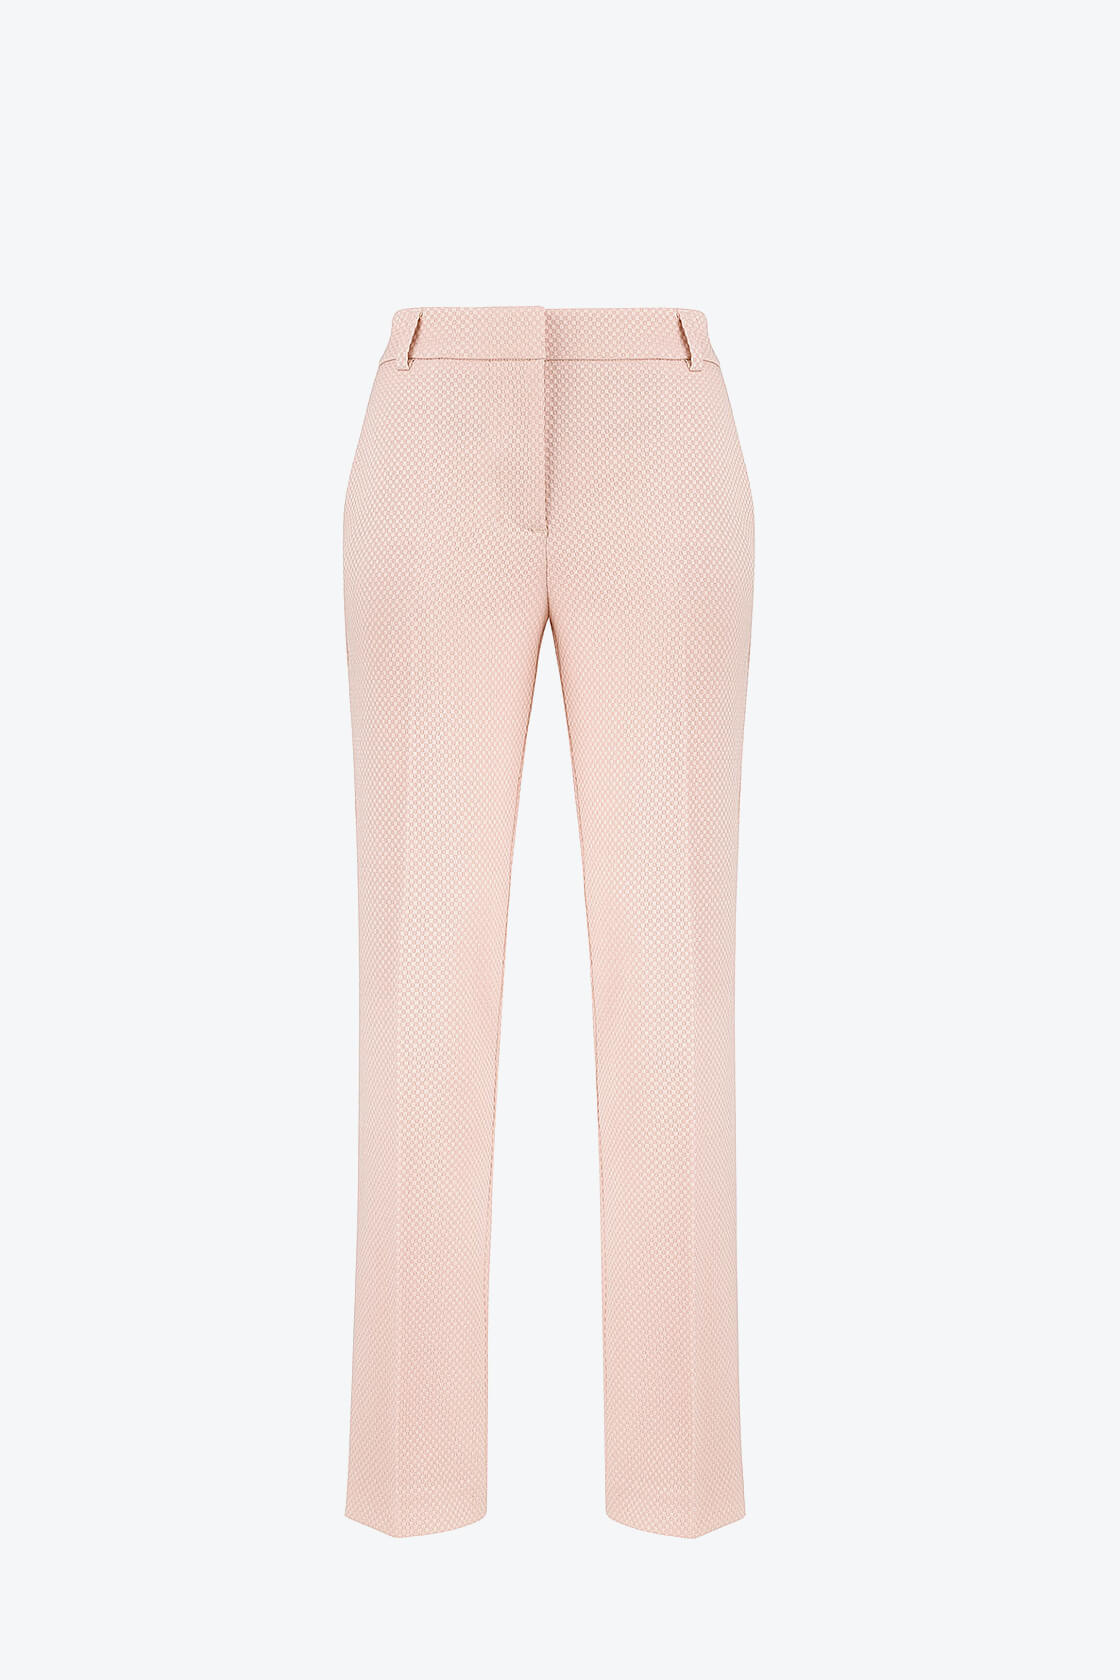 OL100002641 Dana Slim Fit Pleated Pants Rosewater1